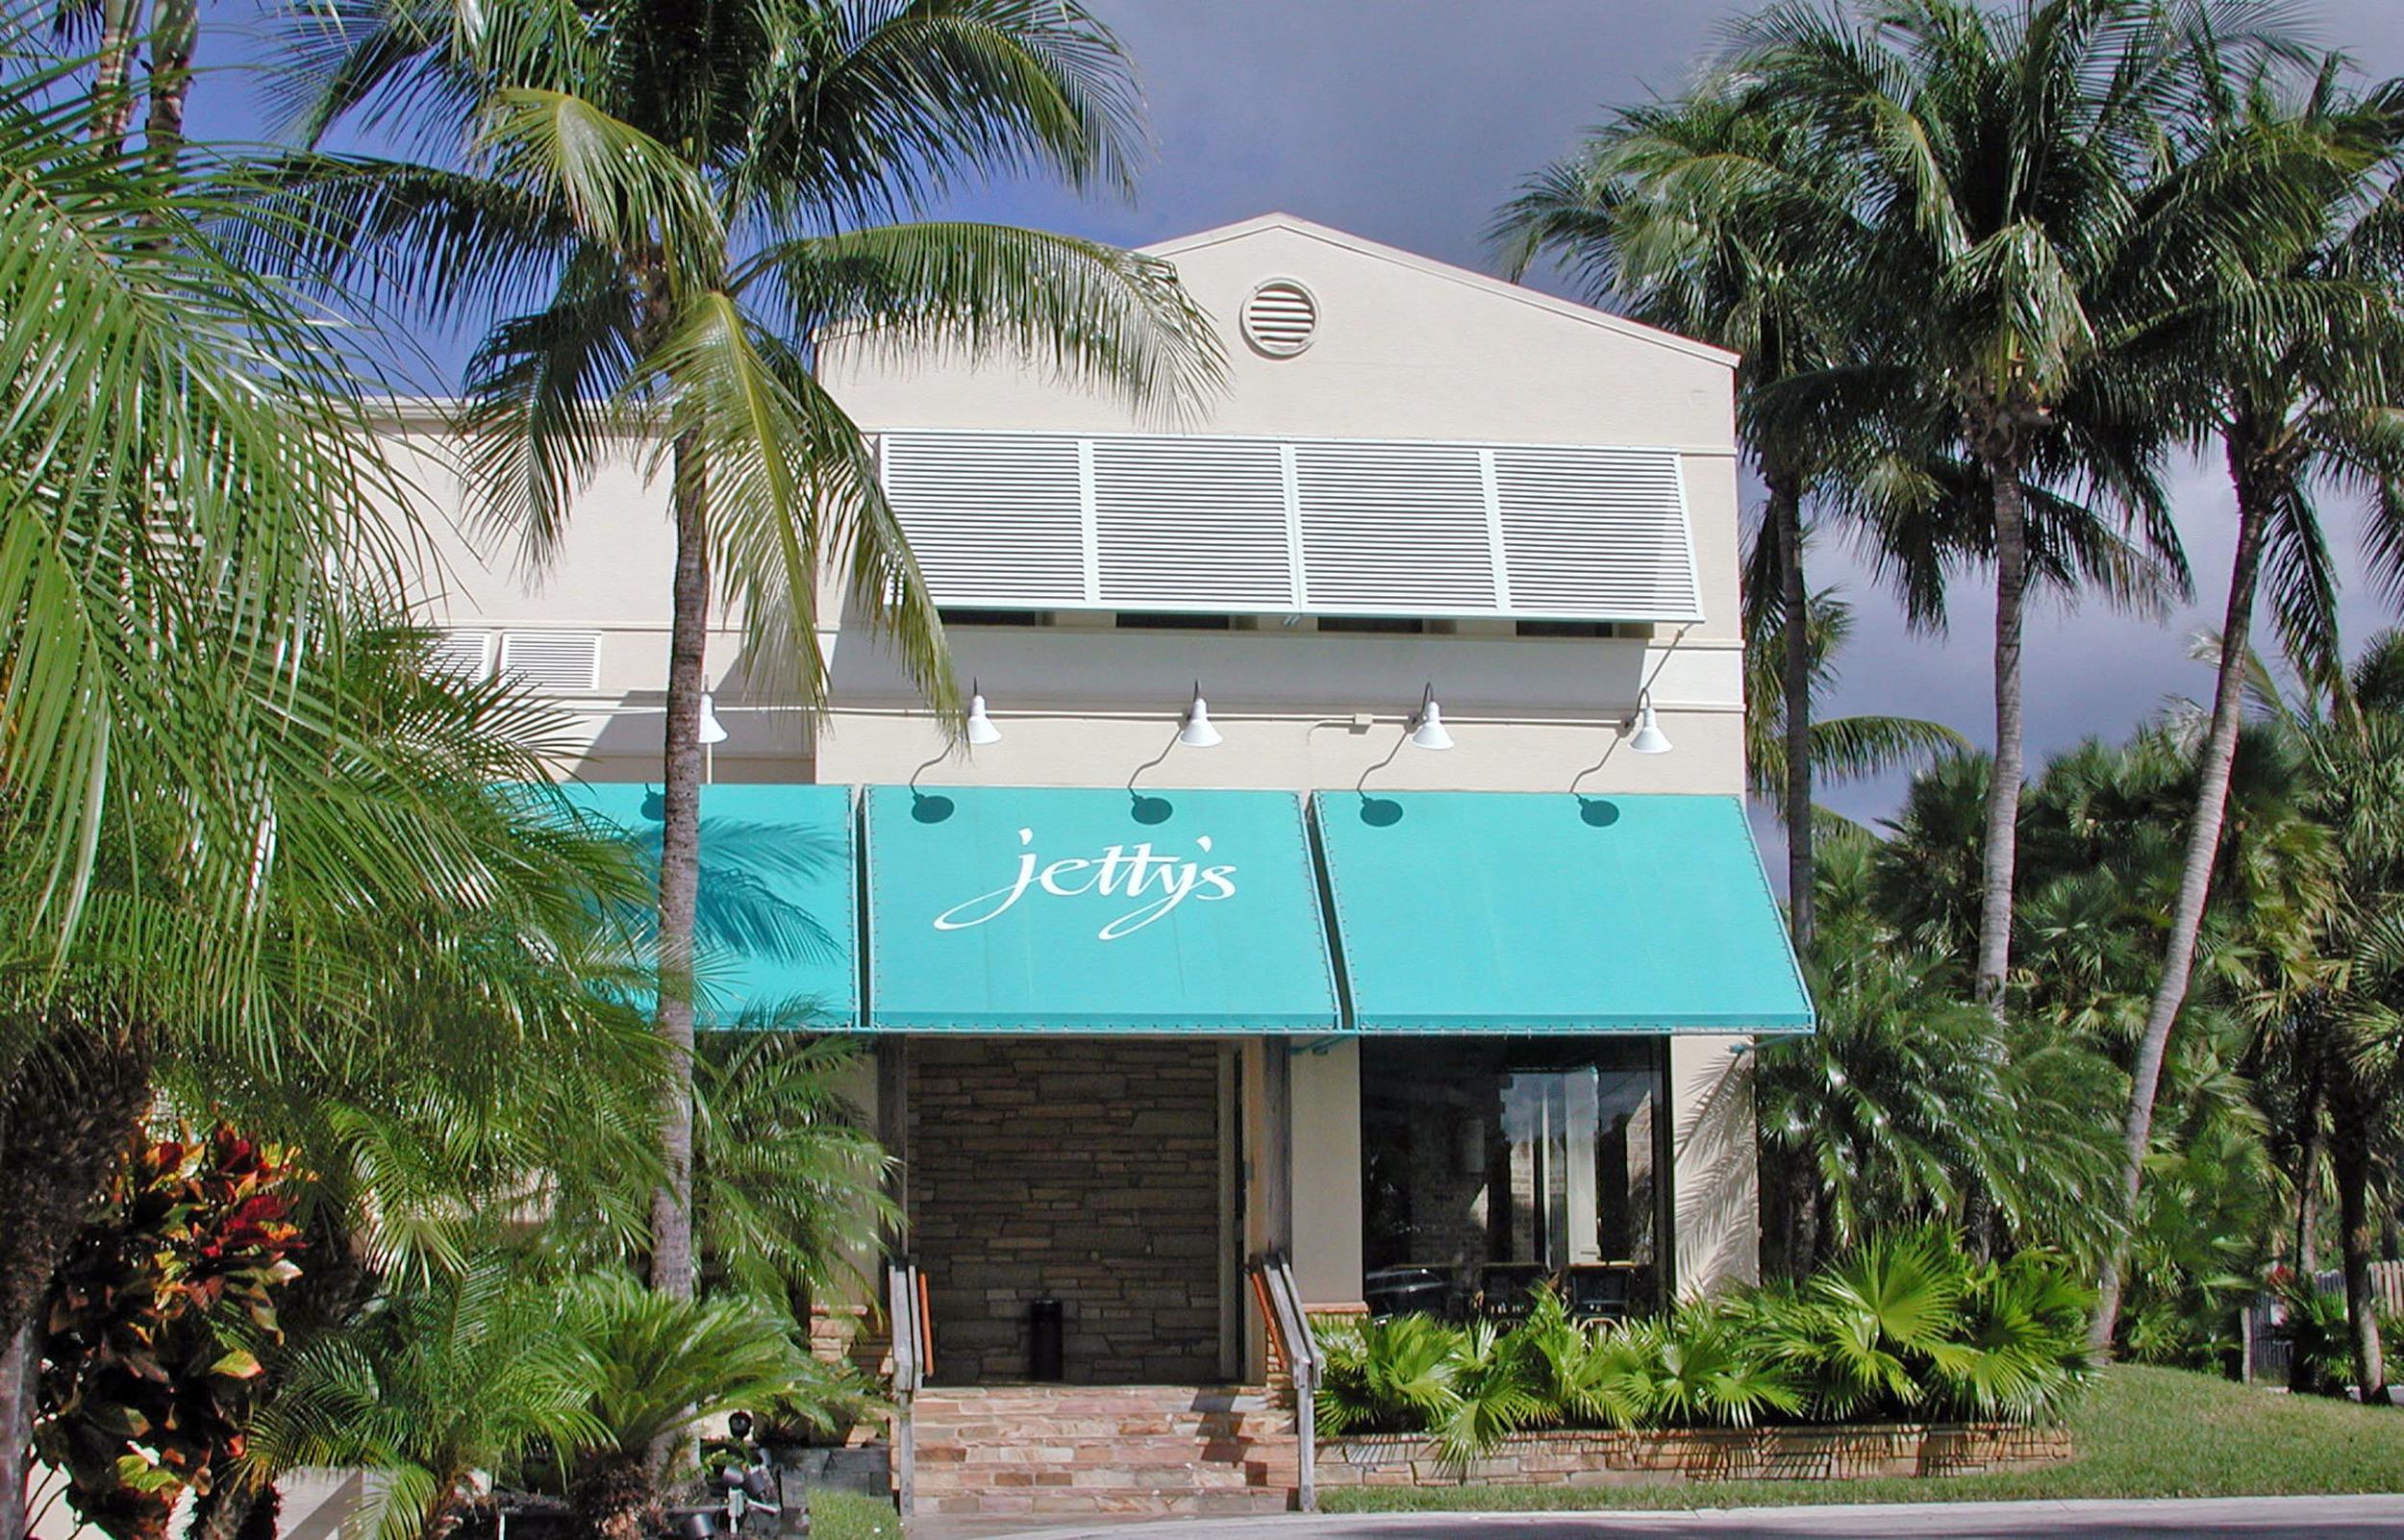 Jetty's Restaurant